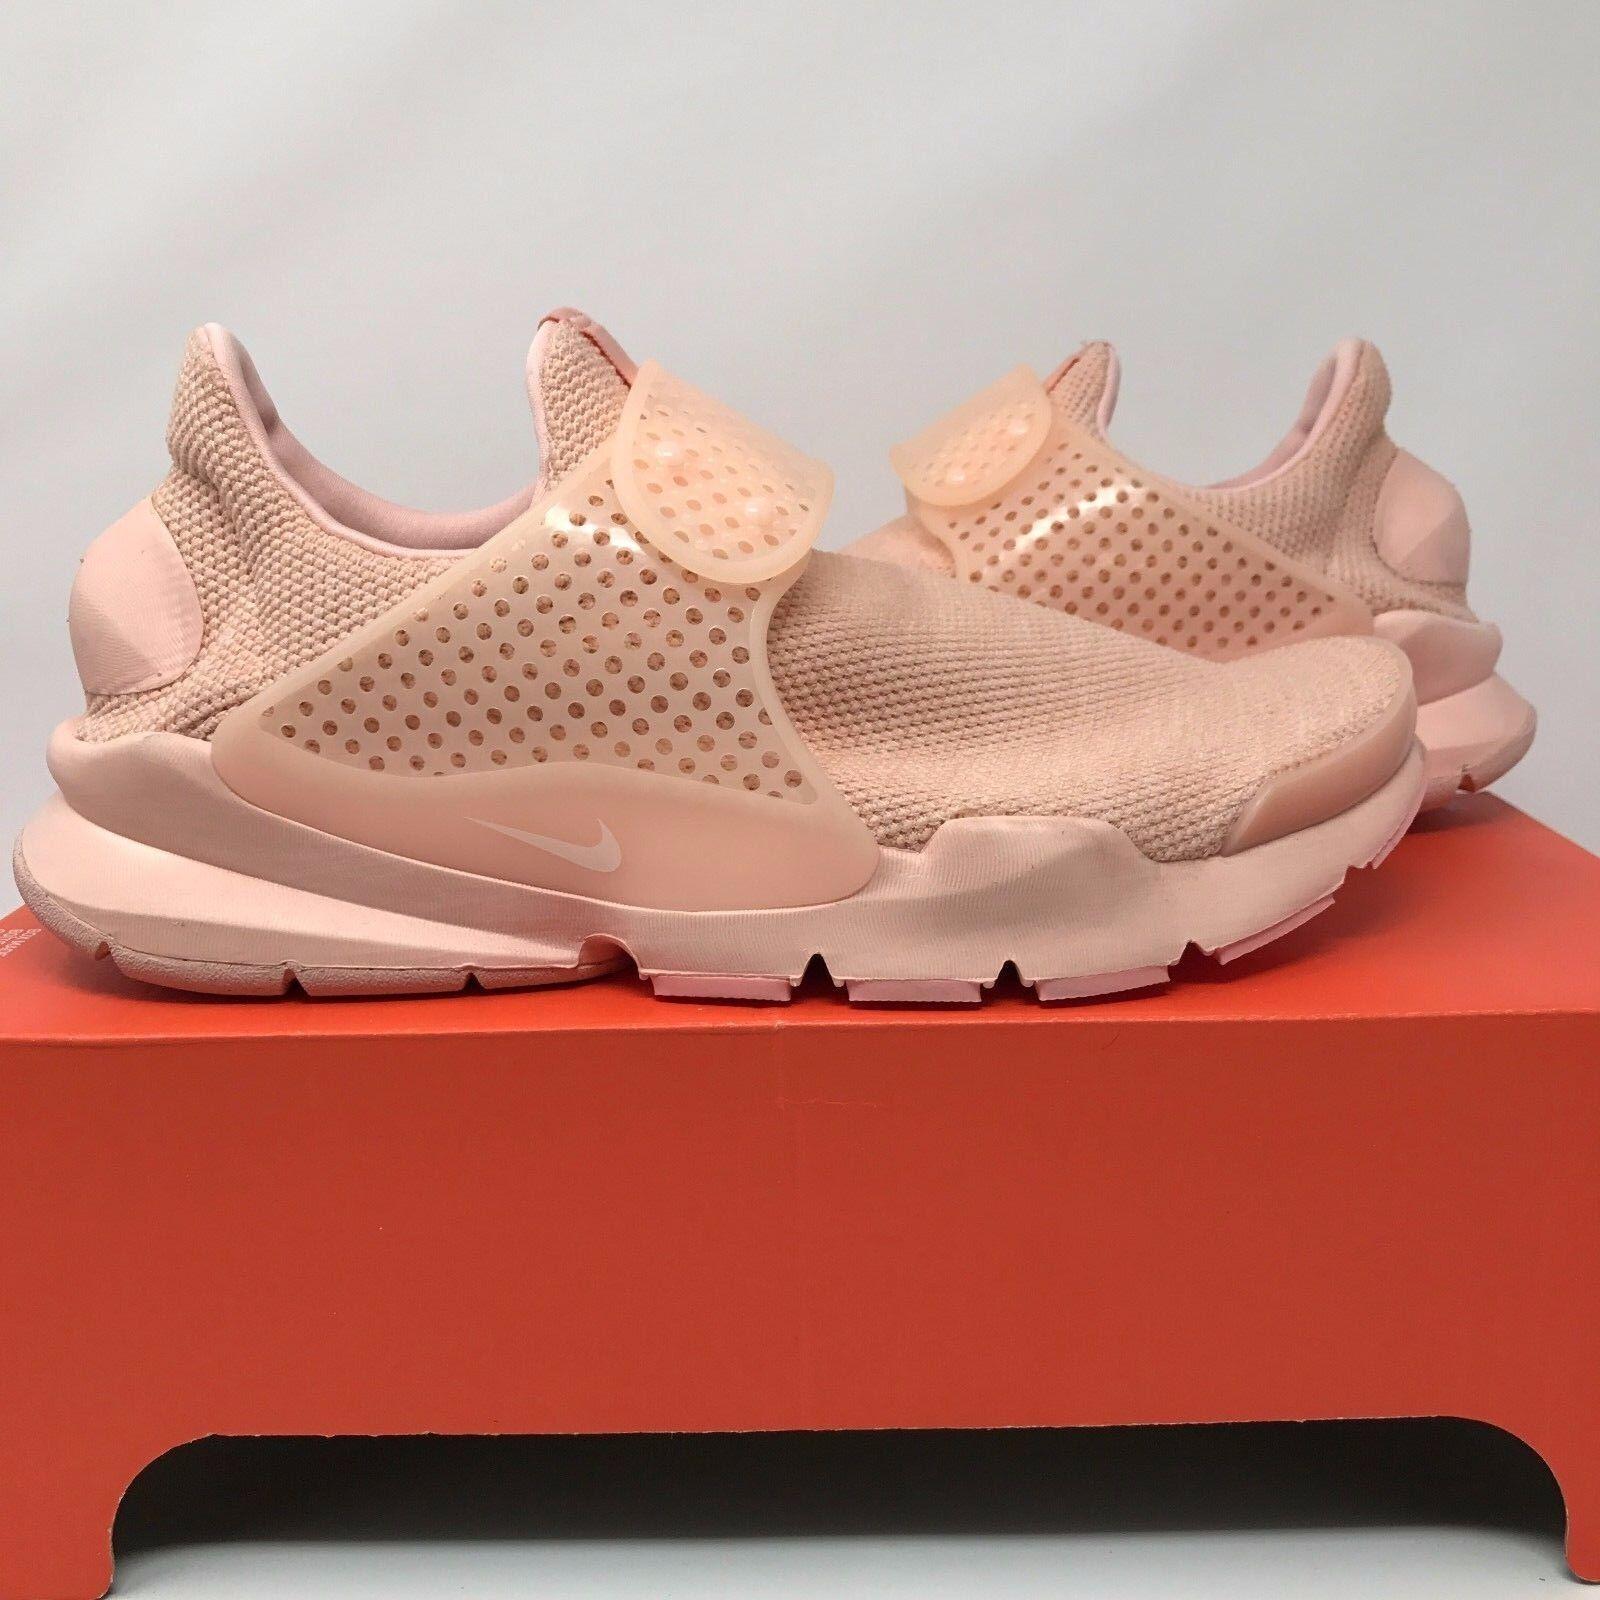 best-selling model of the brand Nike Sock Dart Breathe Arctic Orange 909551-800 - BR Presto Flyknit NMD Boost OG